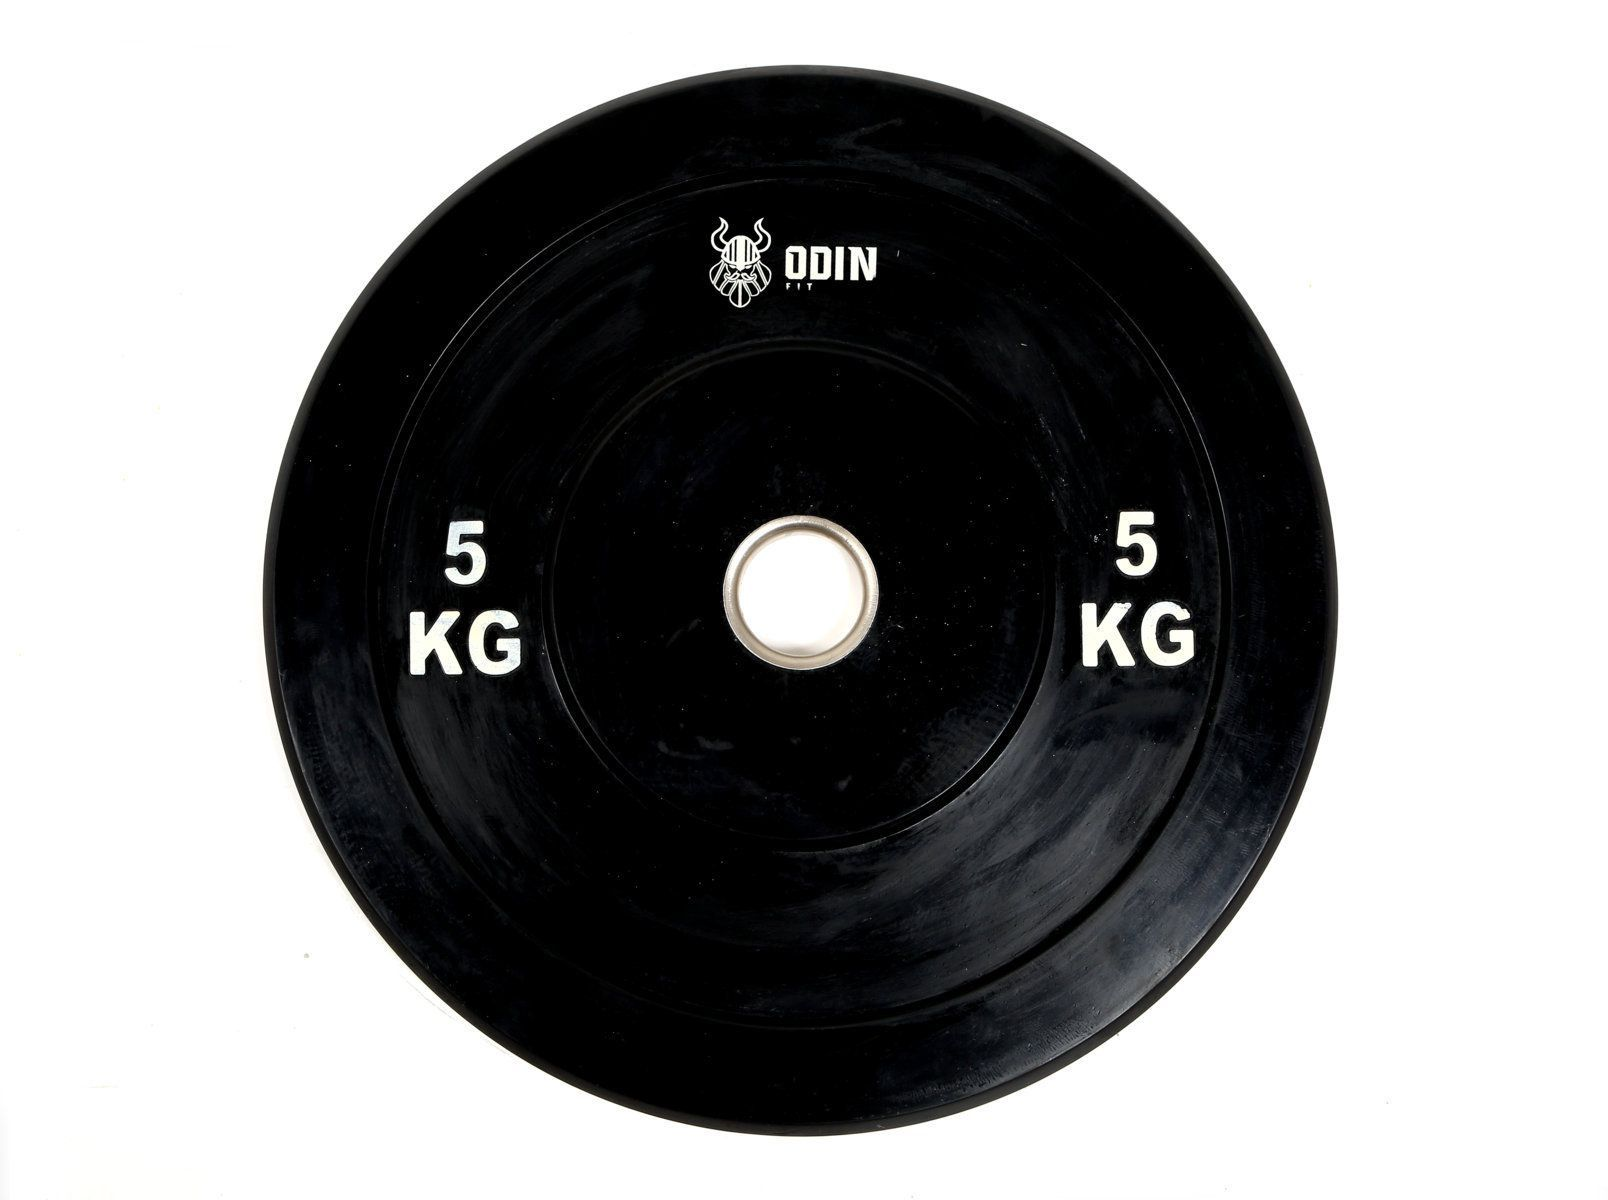 Anilha Olímpica em Borracha 5Kg - Odin Fit